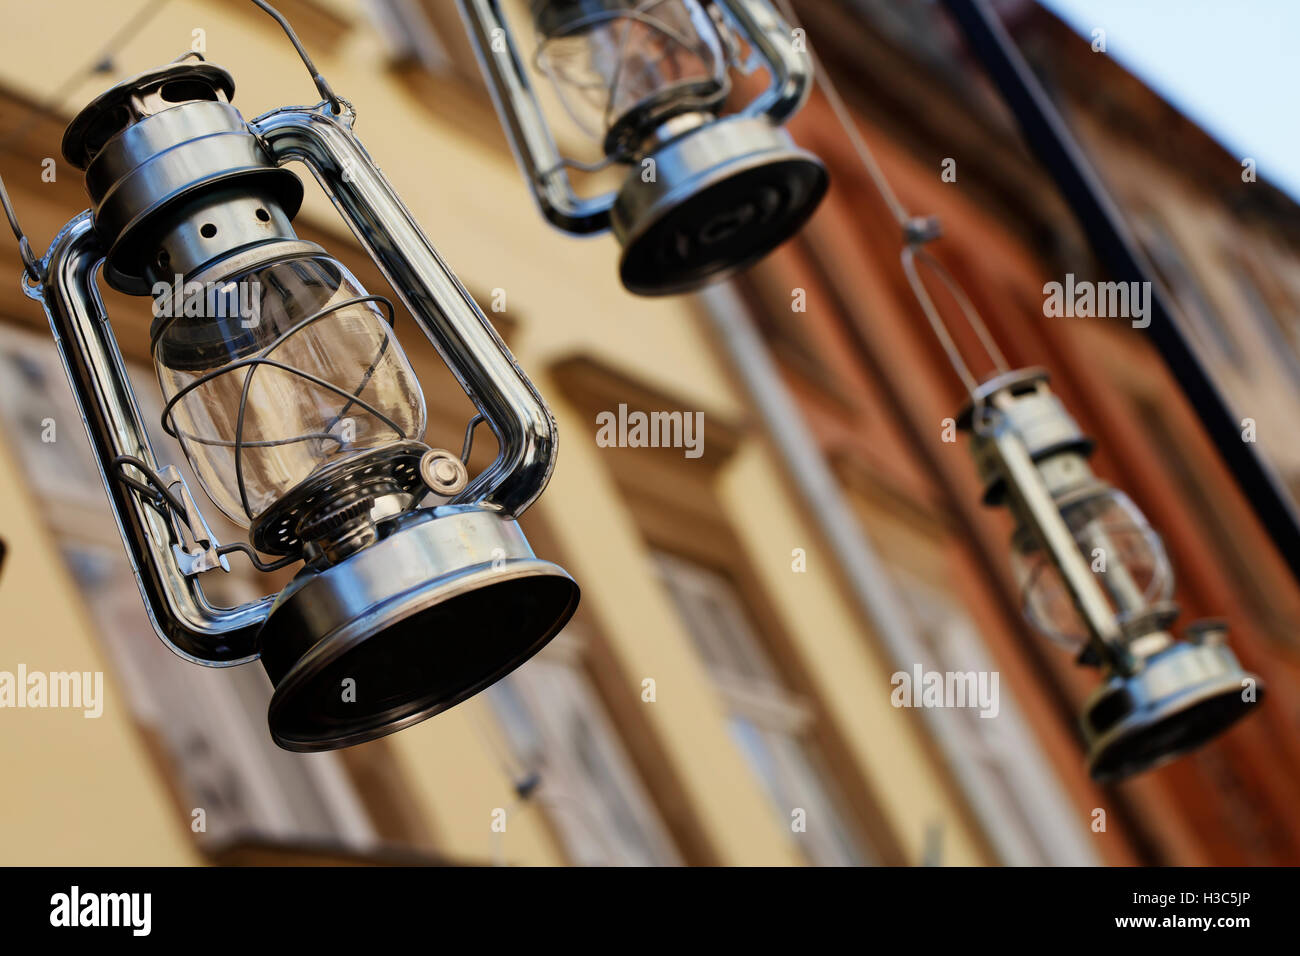 a Vintage kerosene lamp, retro lighting background - Stock Image